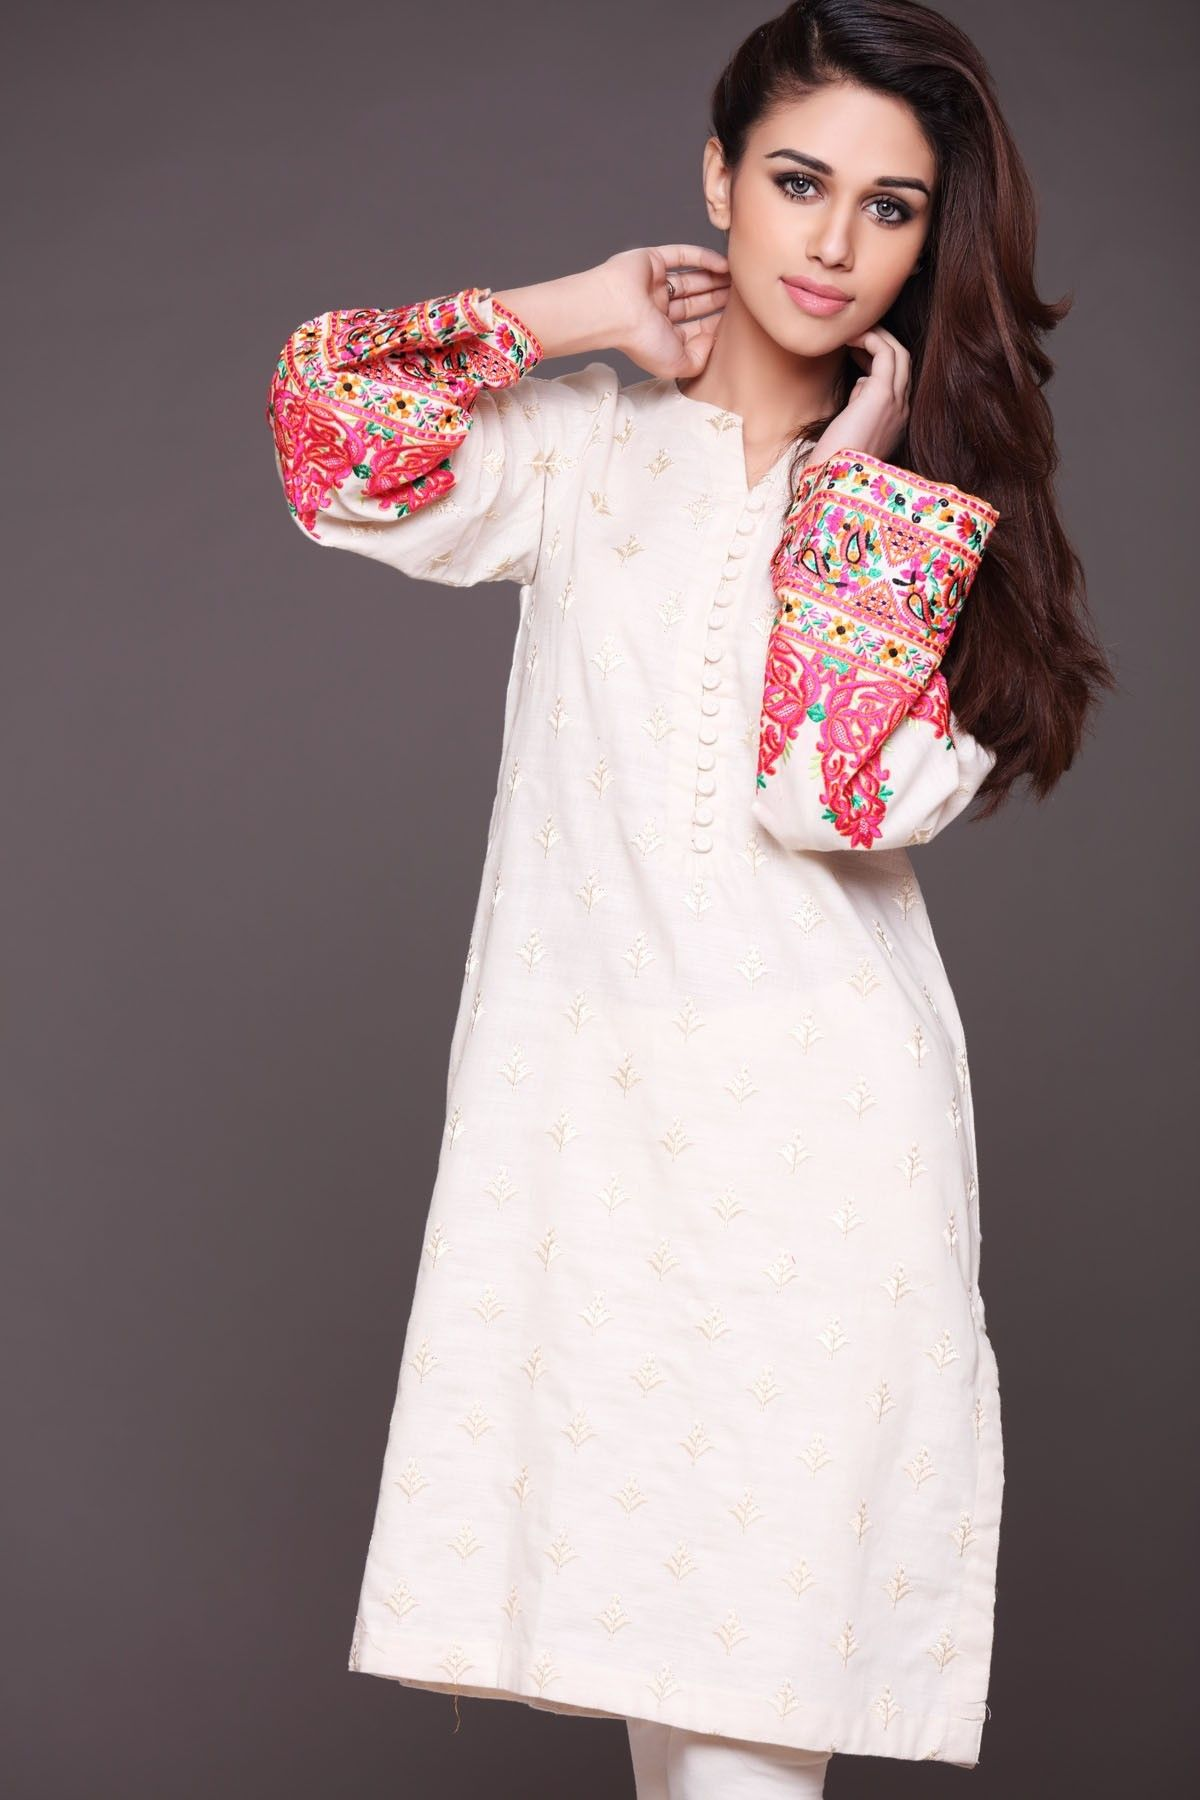 Meet Tomo Koizumi, the unknown Japanese costume designer ... |New Fashion Designers